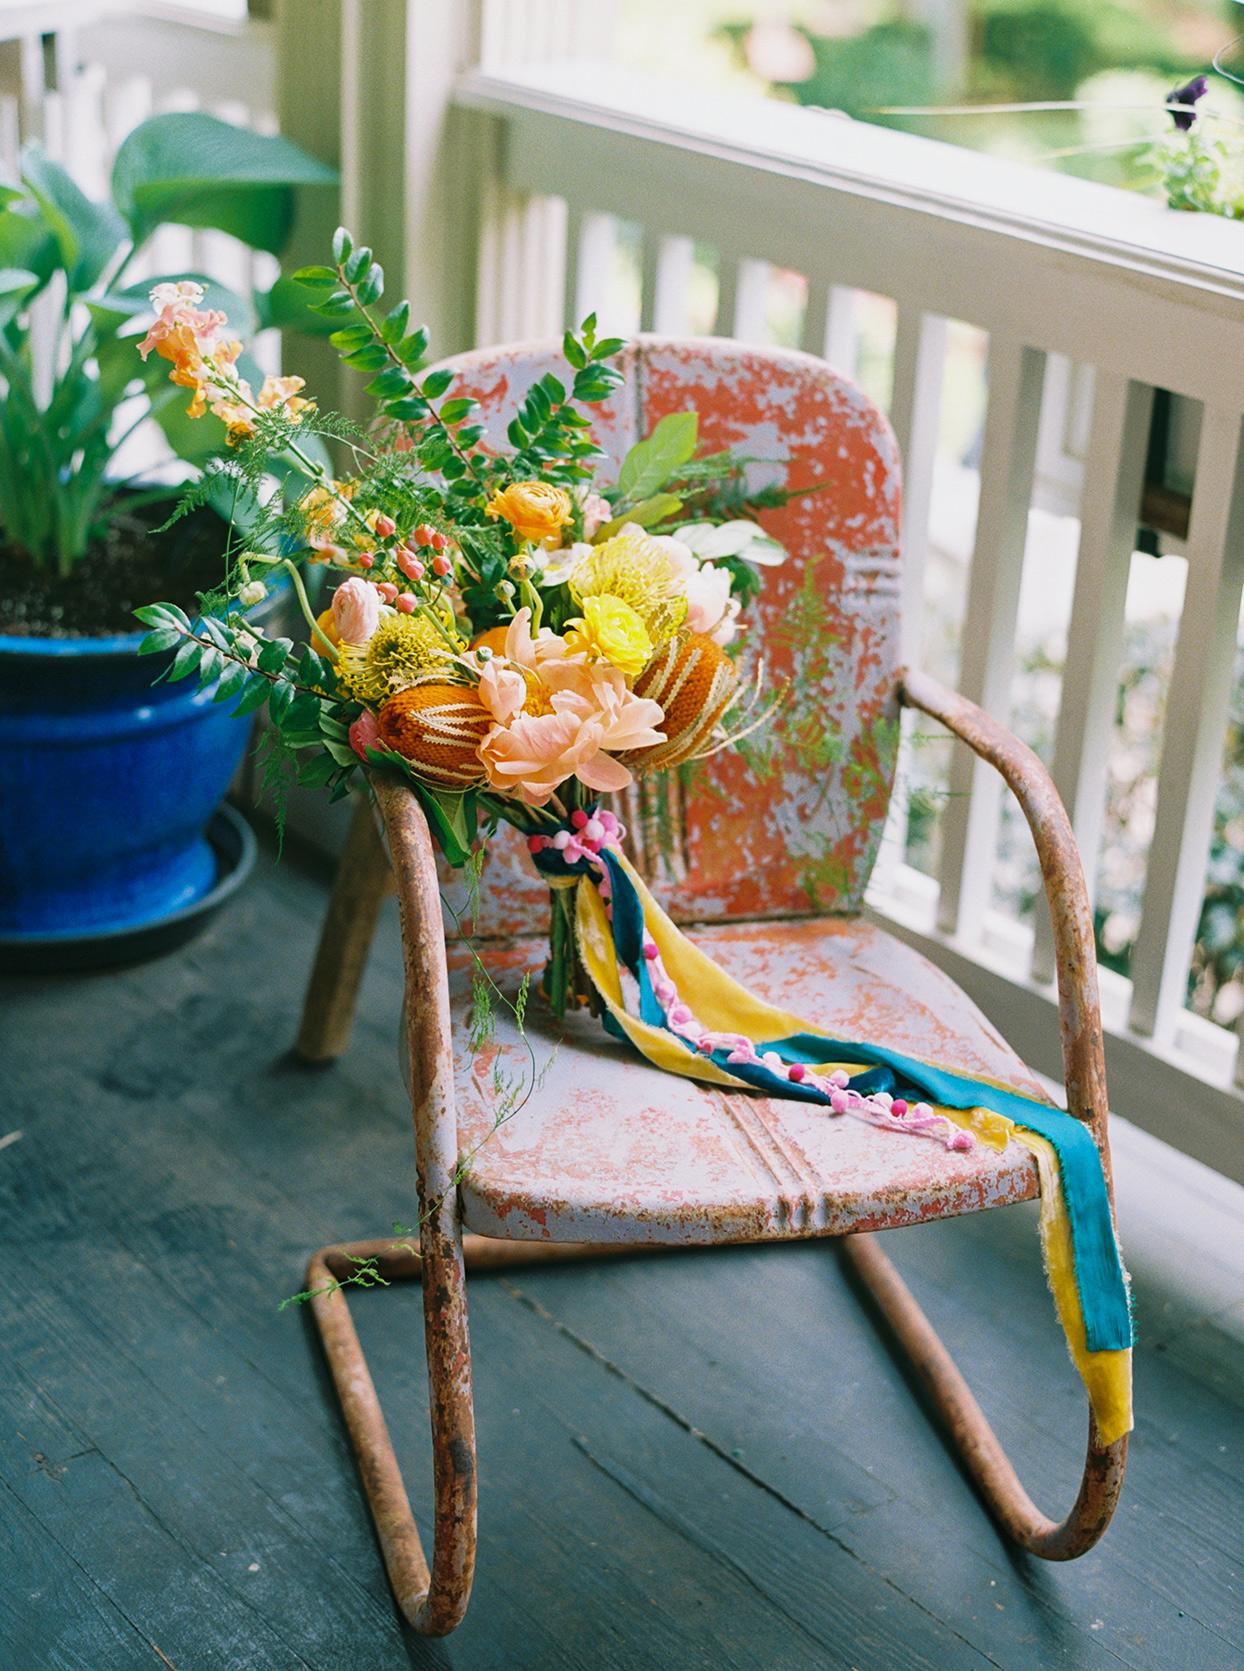 ashley scott colorful wedding bouquet on antique chair